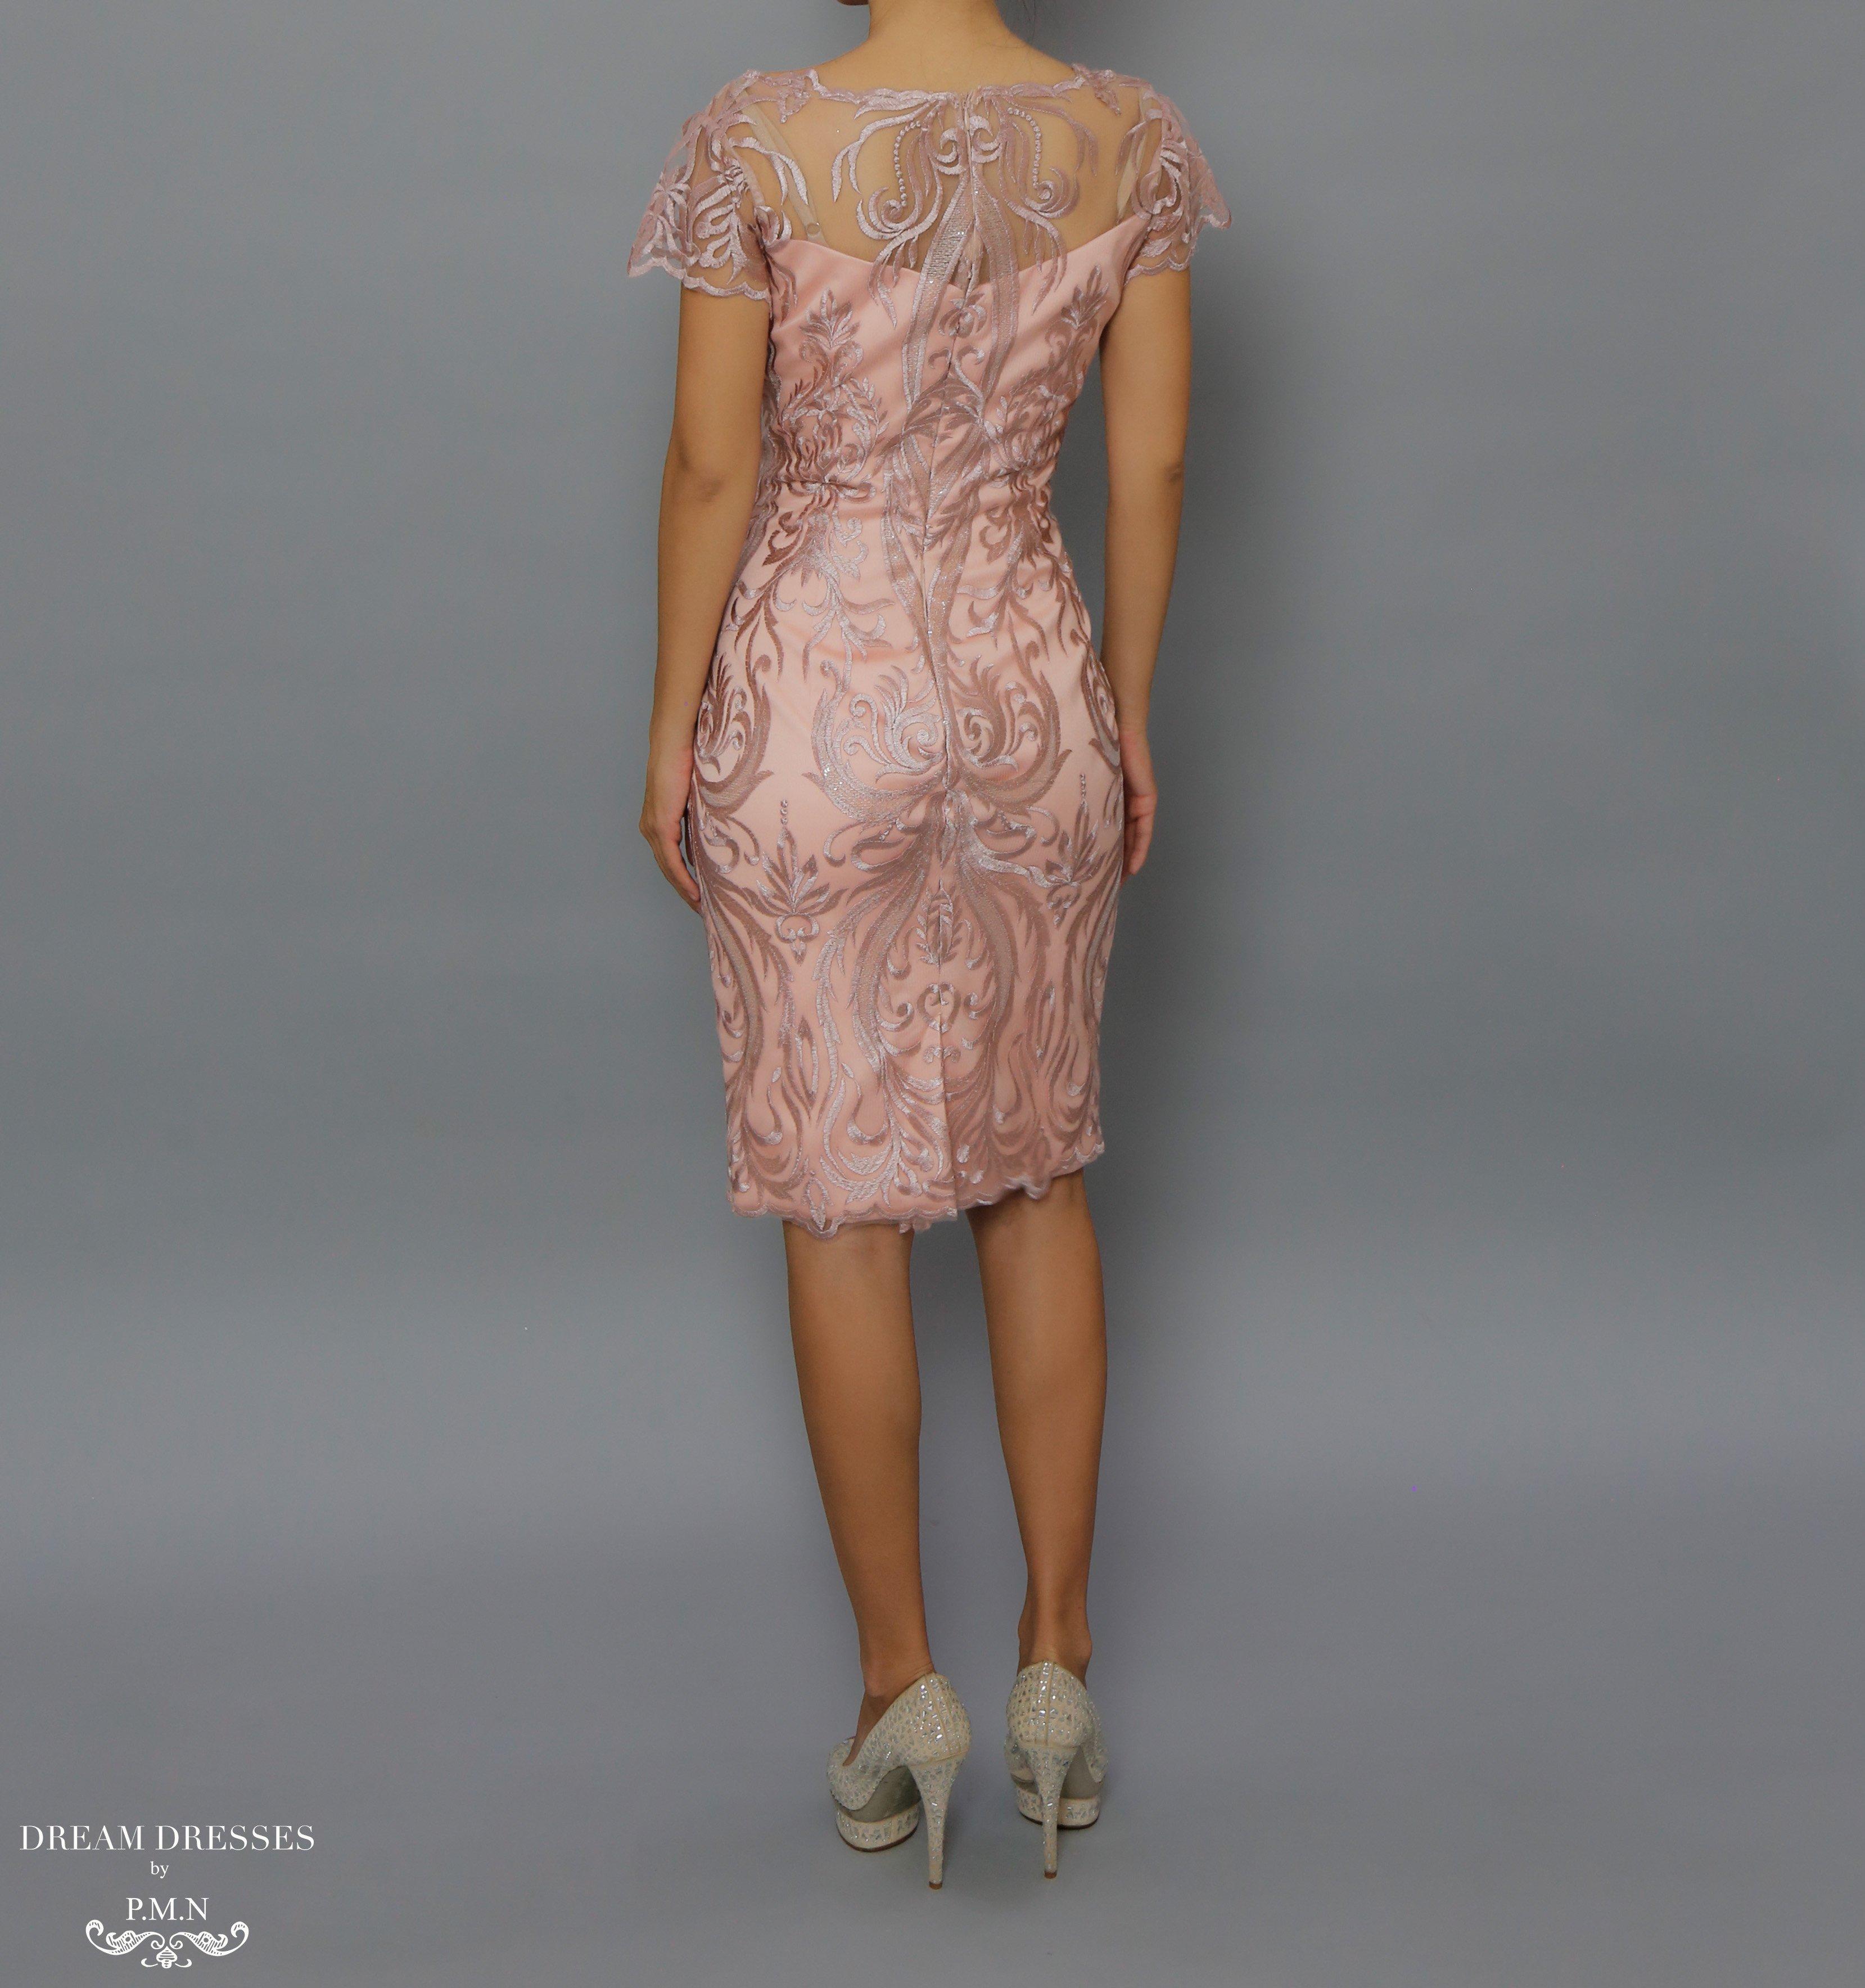 Mother Of The Bride Knee Length Dress Camilla Blush Pink Knee Length Dress Midi Lace Dress Lace Wedding Guest Dress Mother Of The Bride Dresses Dresses